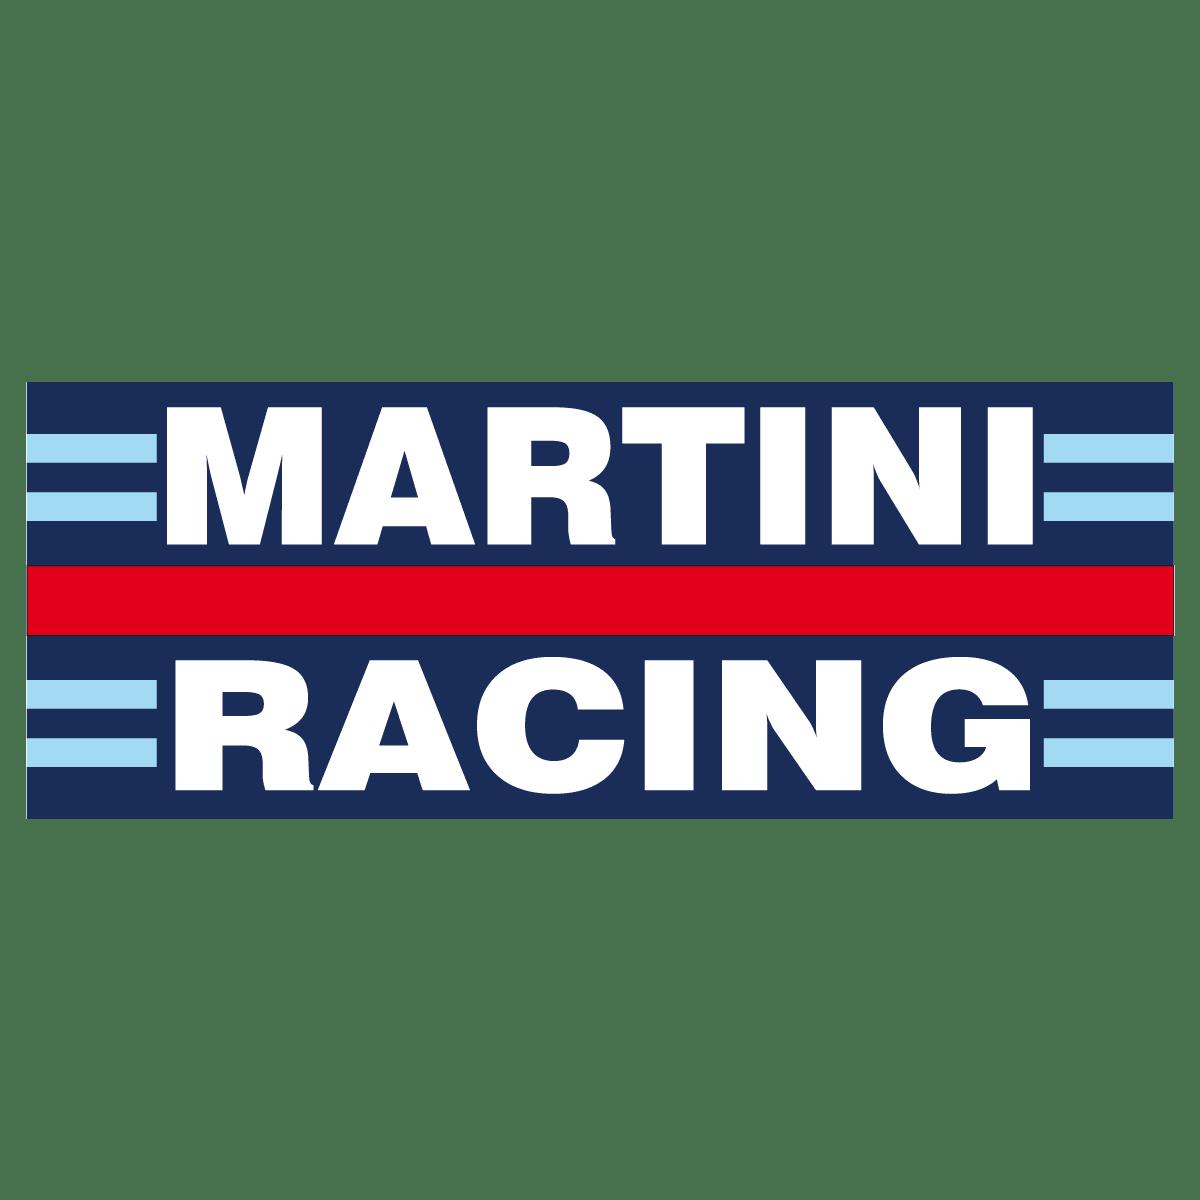 Aufkleber: Martini racing